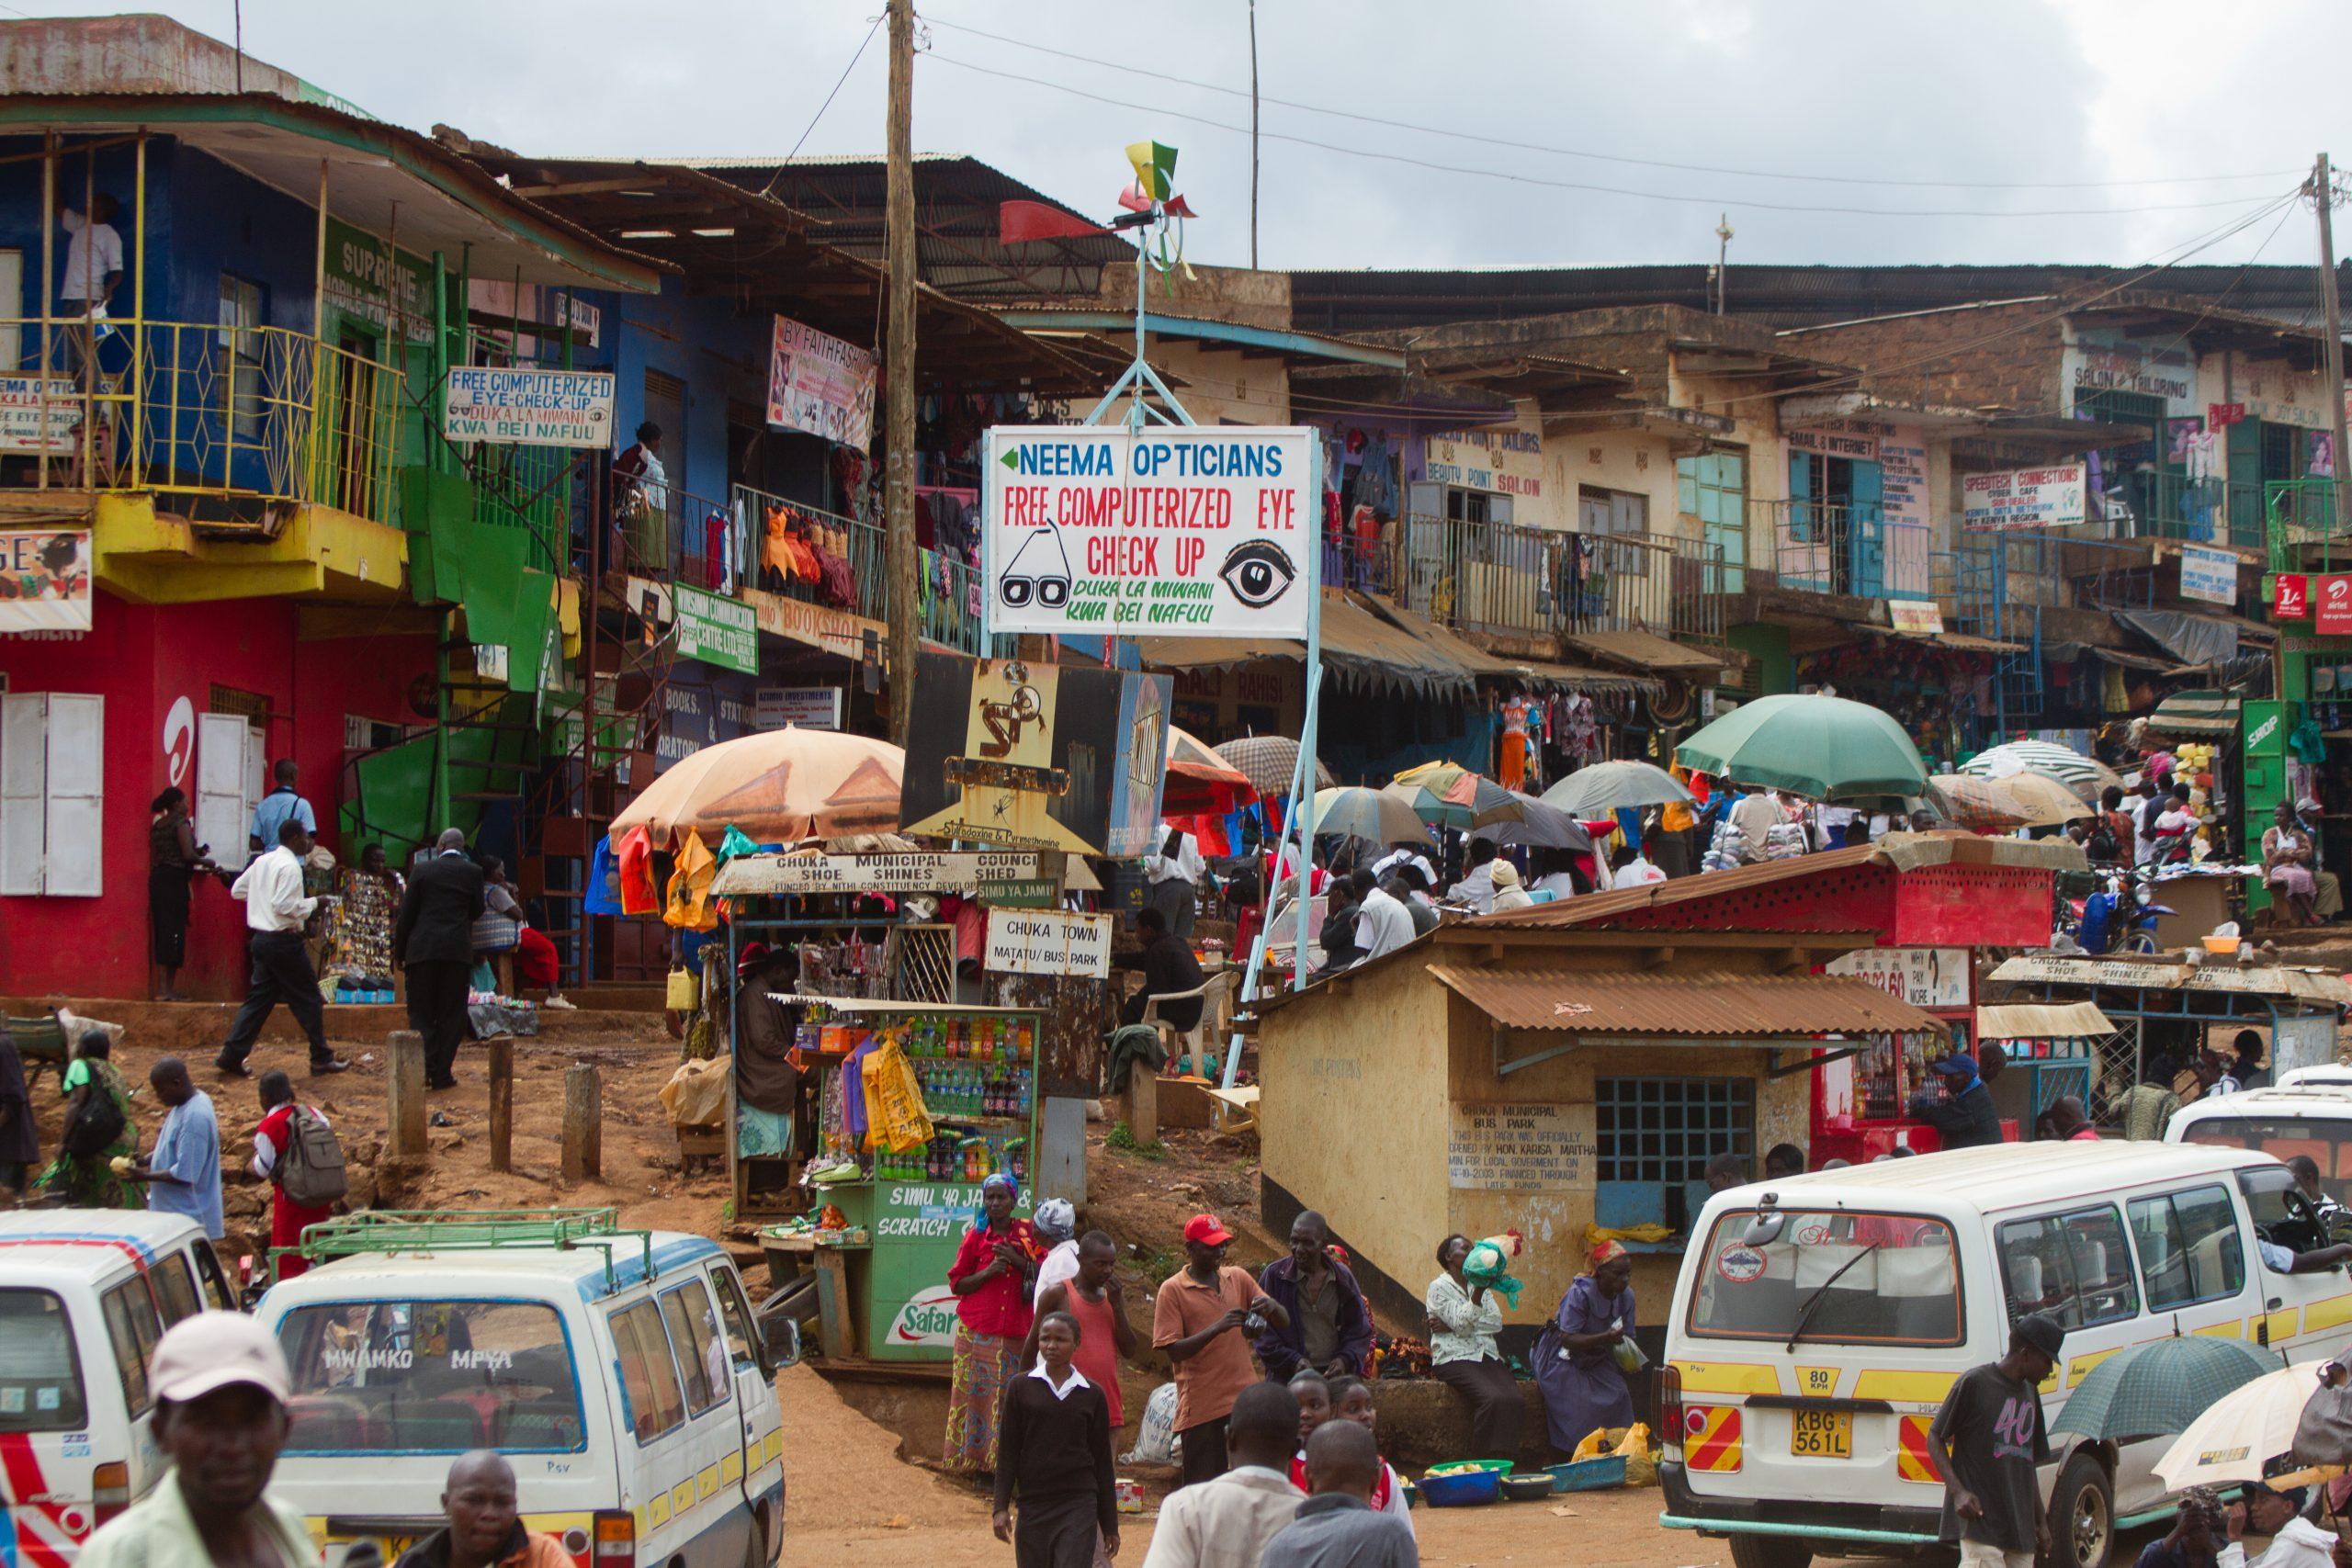 A busy street scene in Nairobi, Kenya